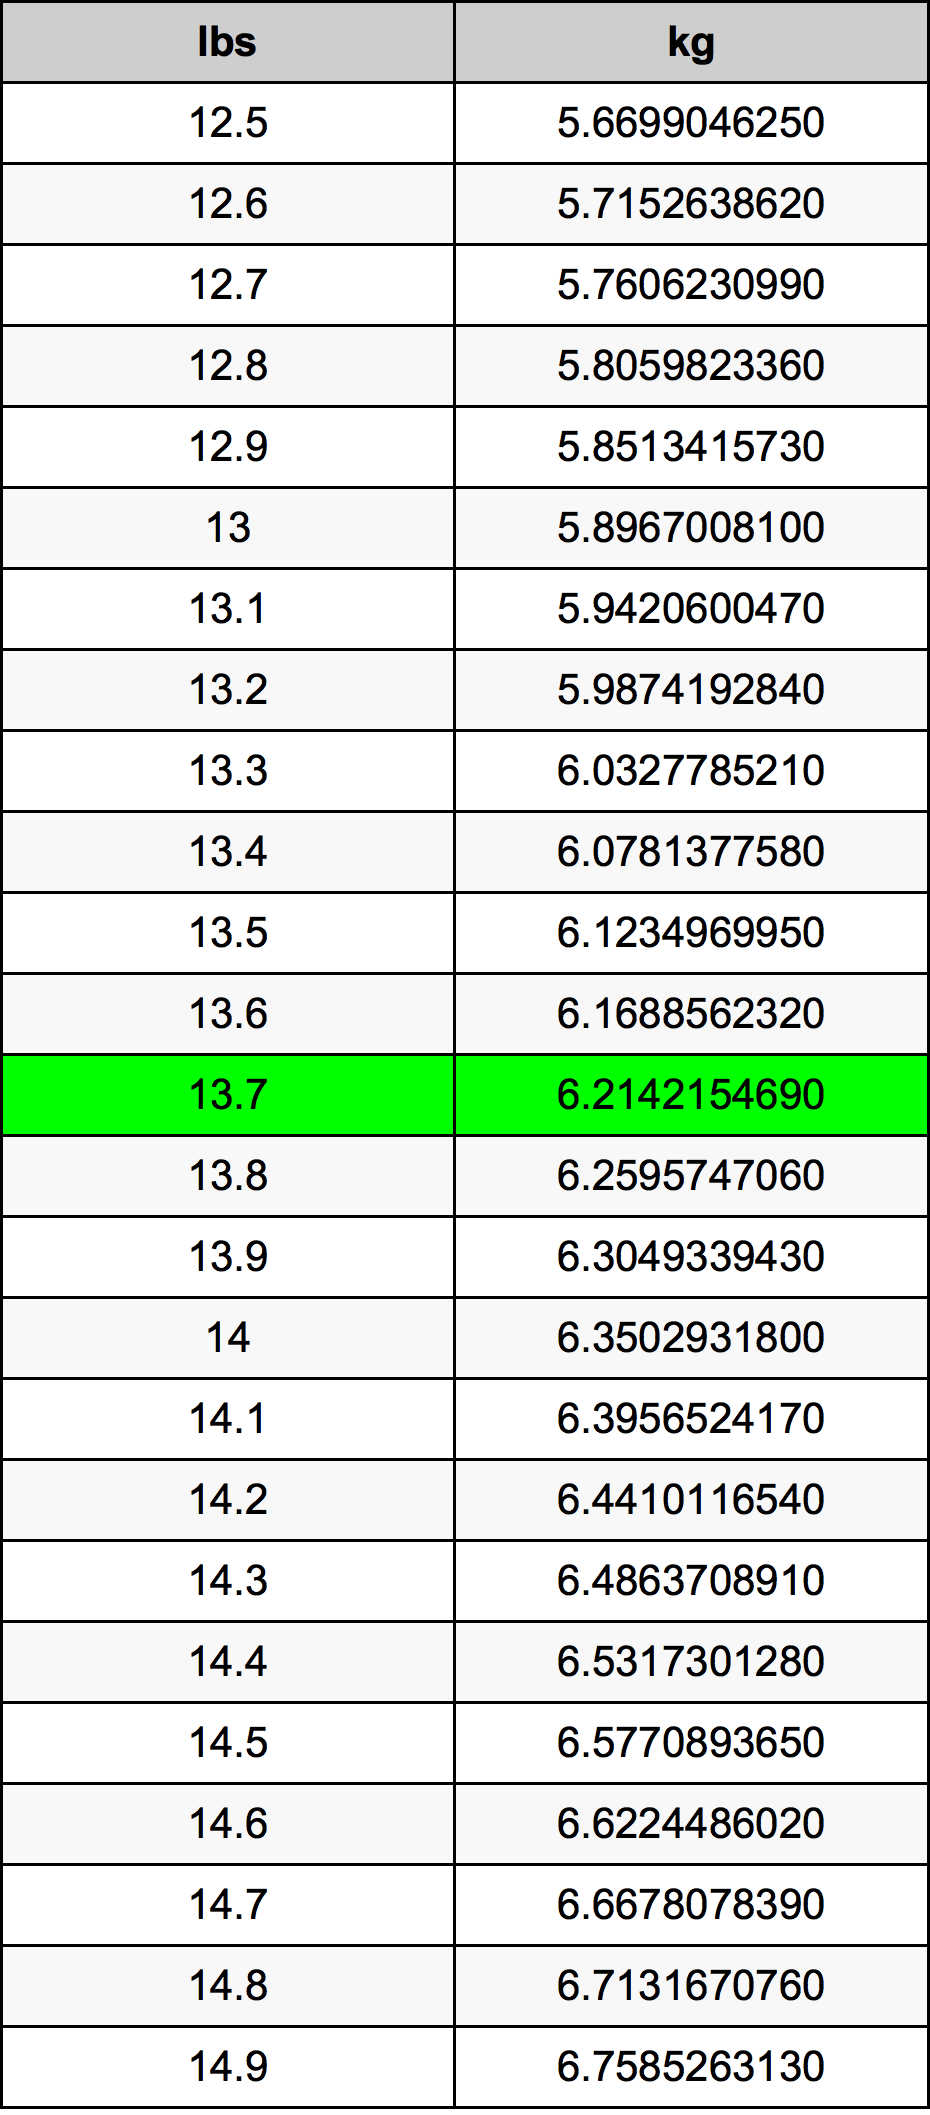 13.7 Pond conversietabel